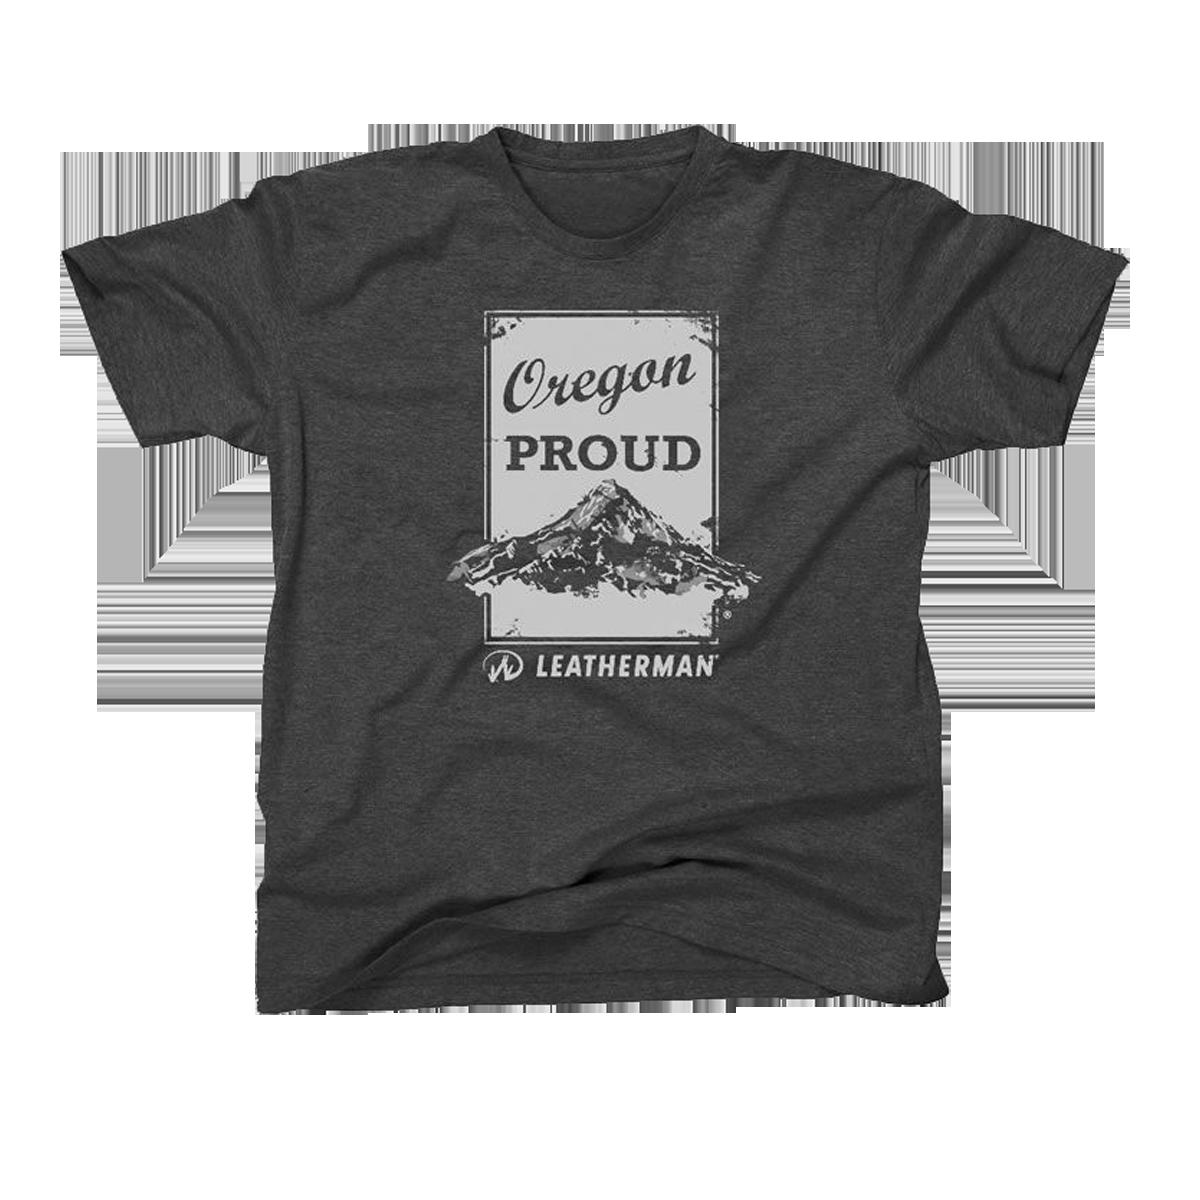 Image of Gray Oregon Proud T-Shirt